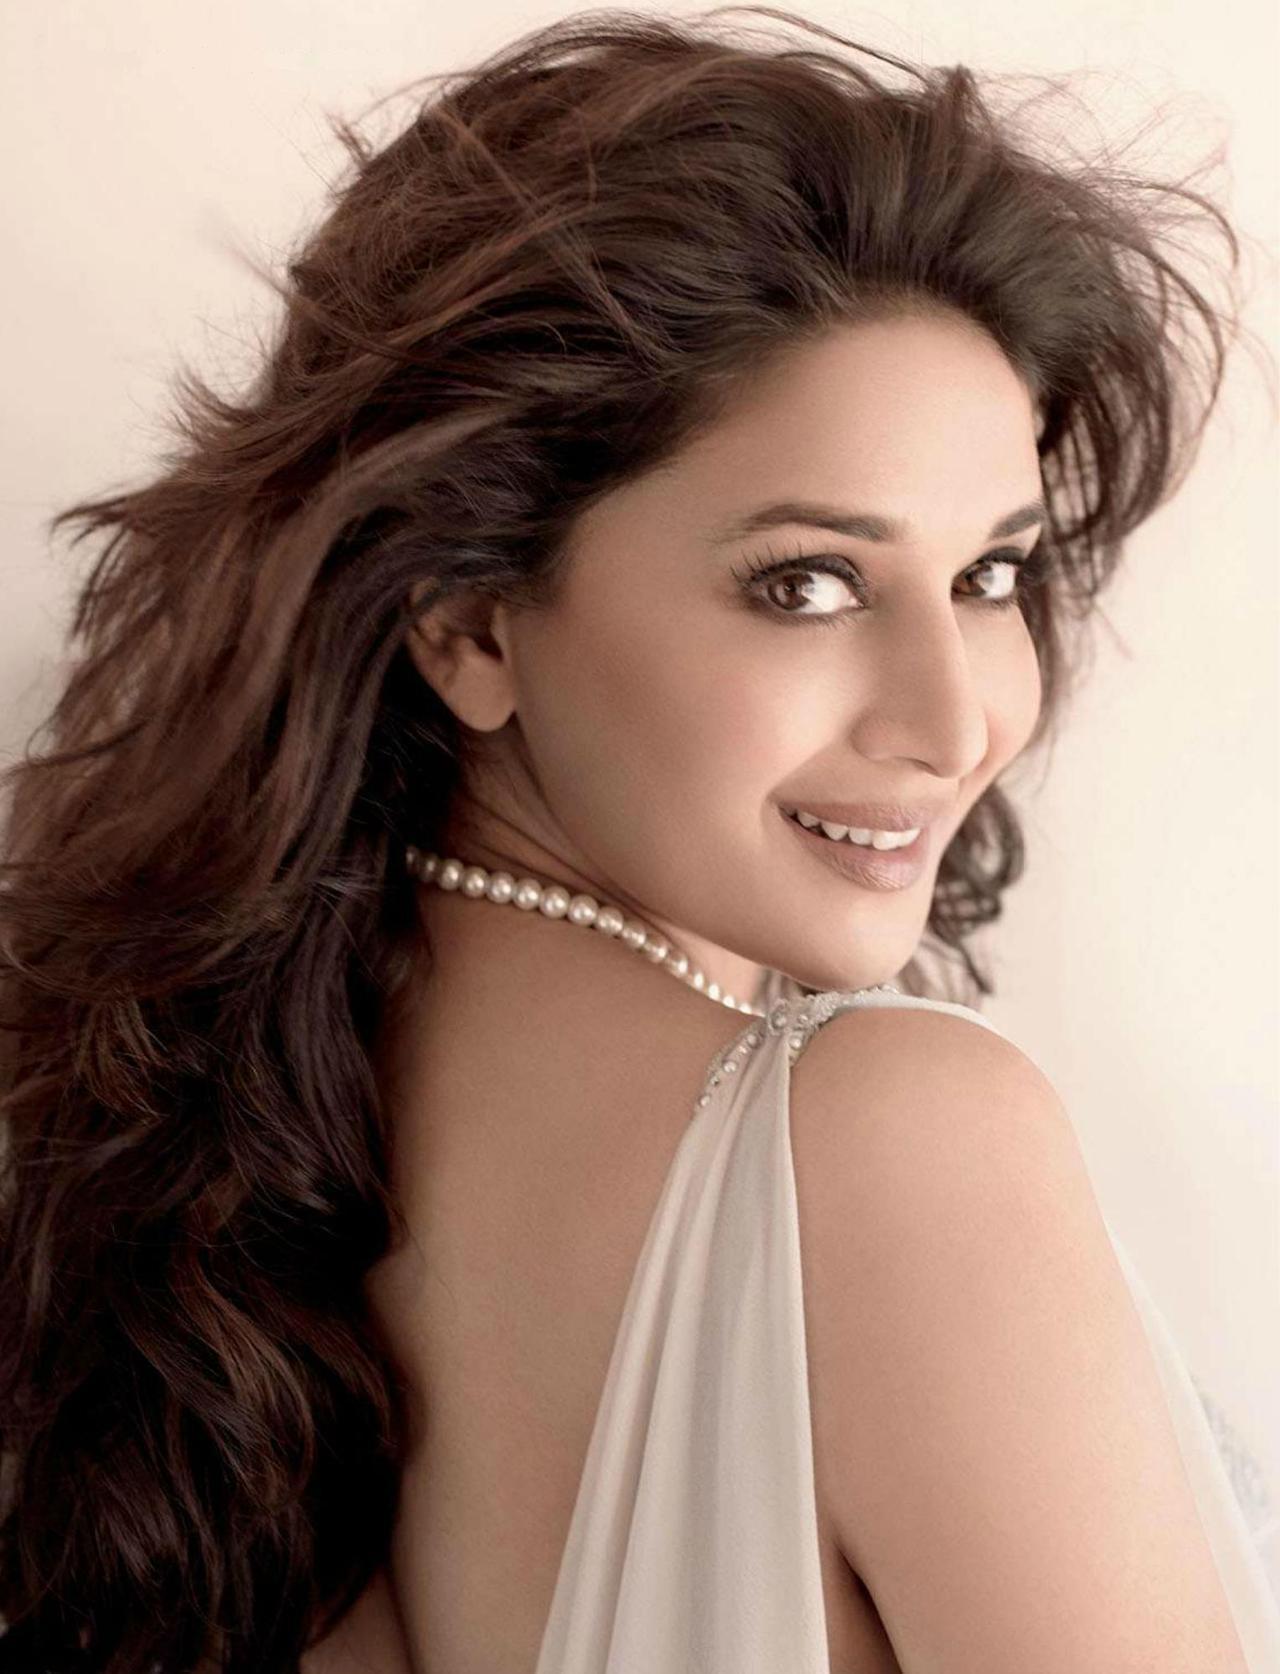 Bollywood Actress Madhuri Dixit Wallpaper Hot Pic 1080p Madhuri Dixit Hd 1223x1600 Download Hd Wallpaper Wallpapertip